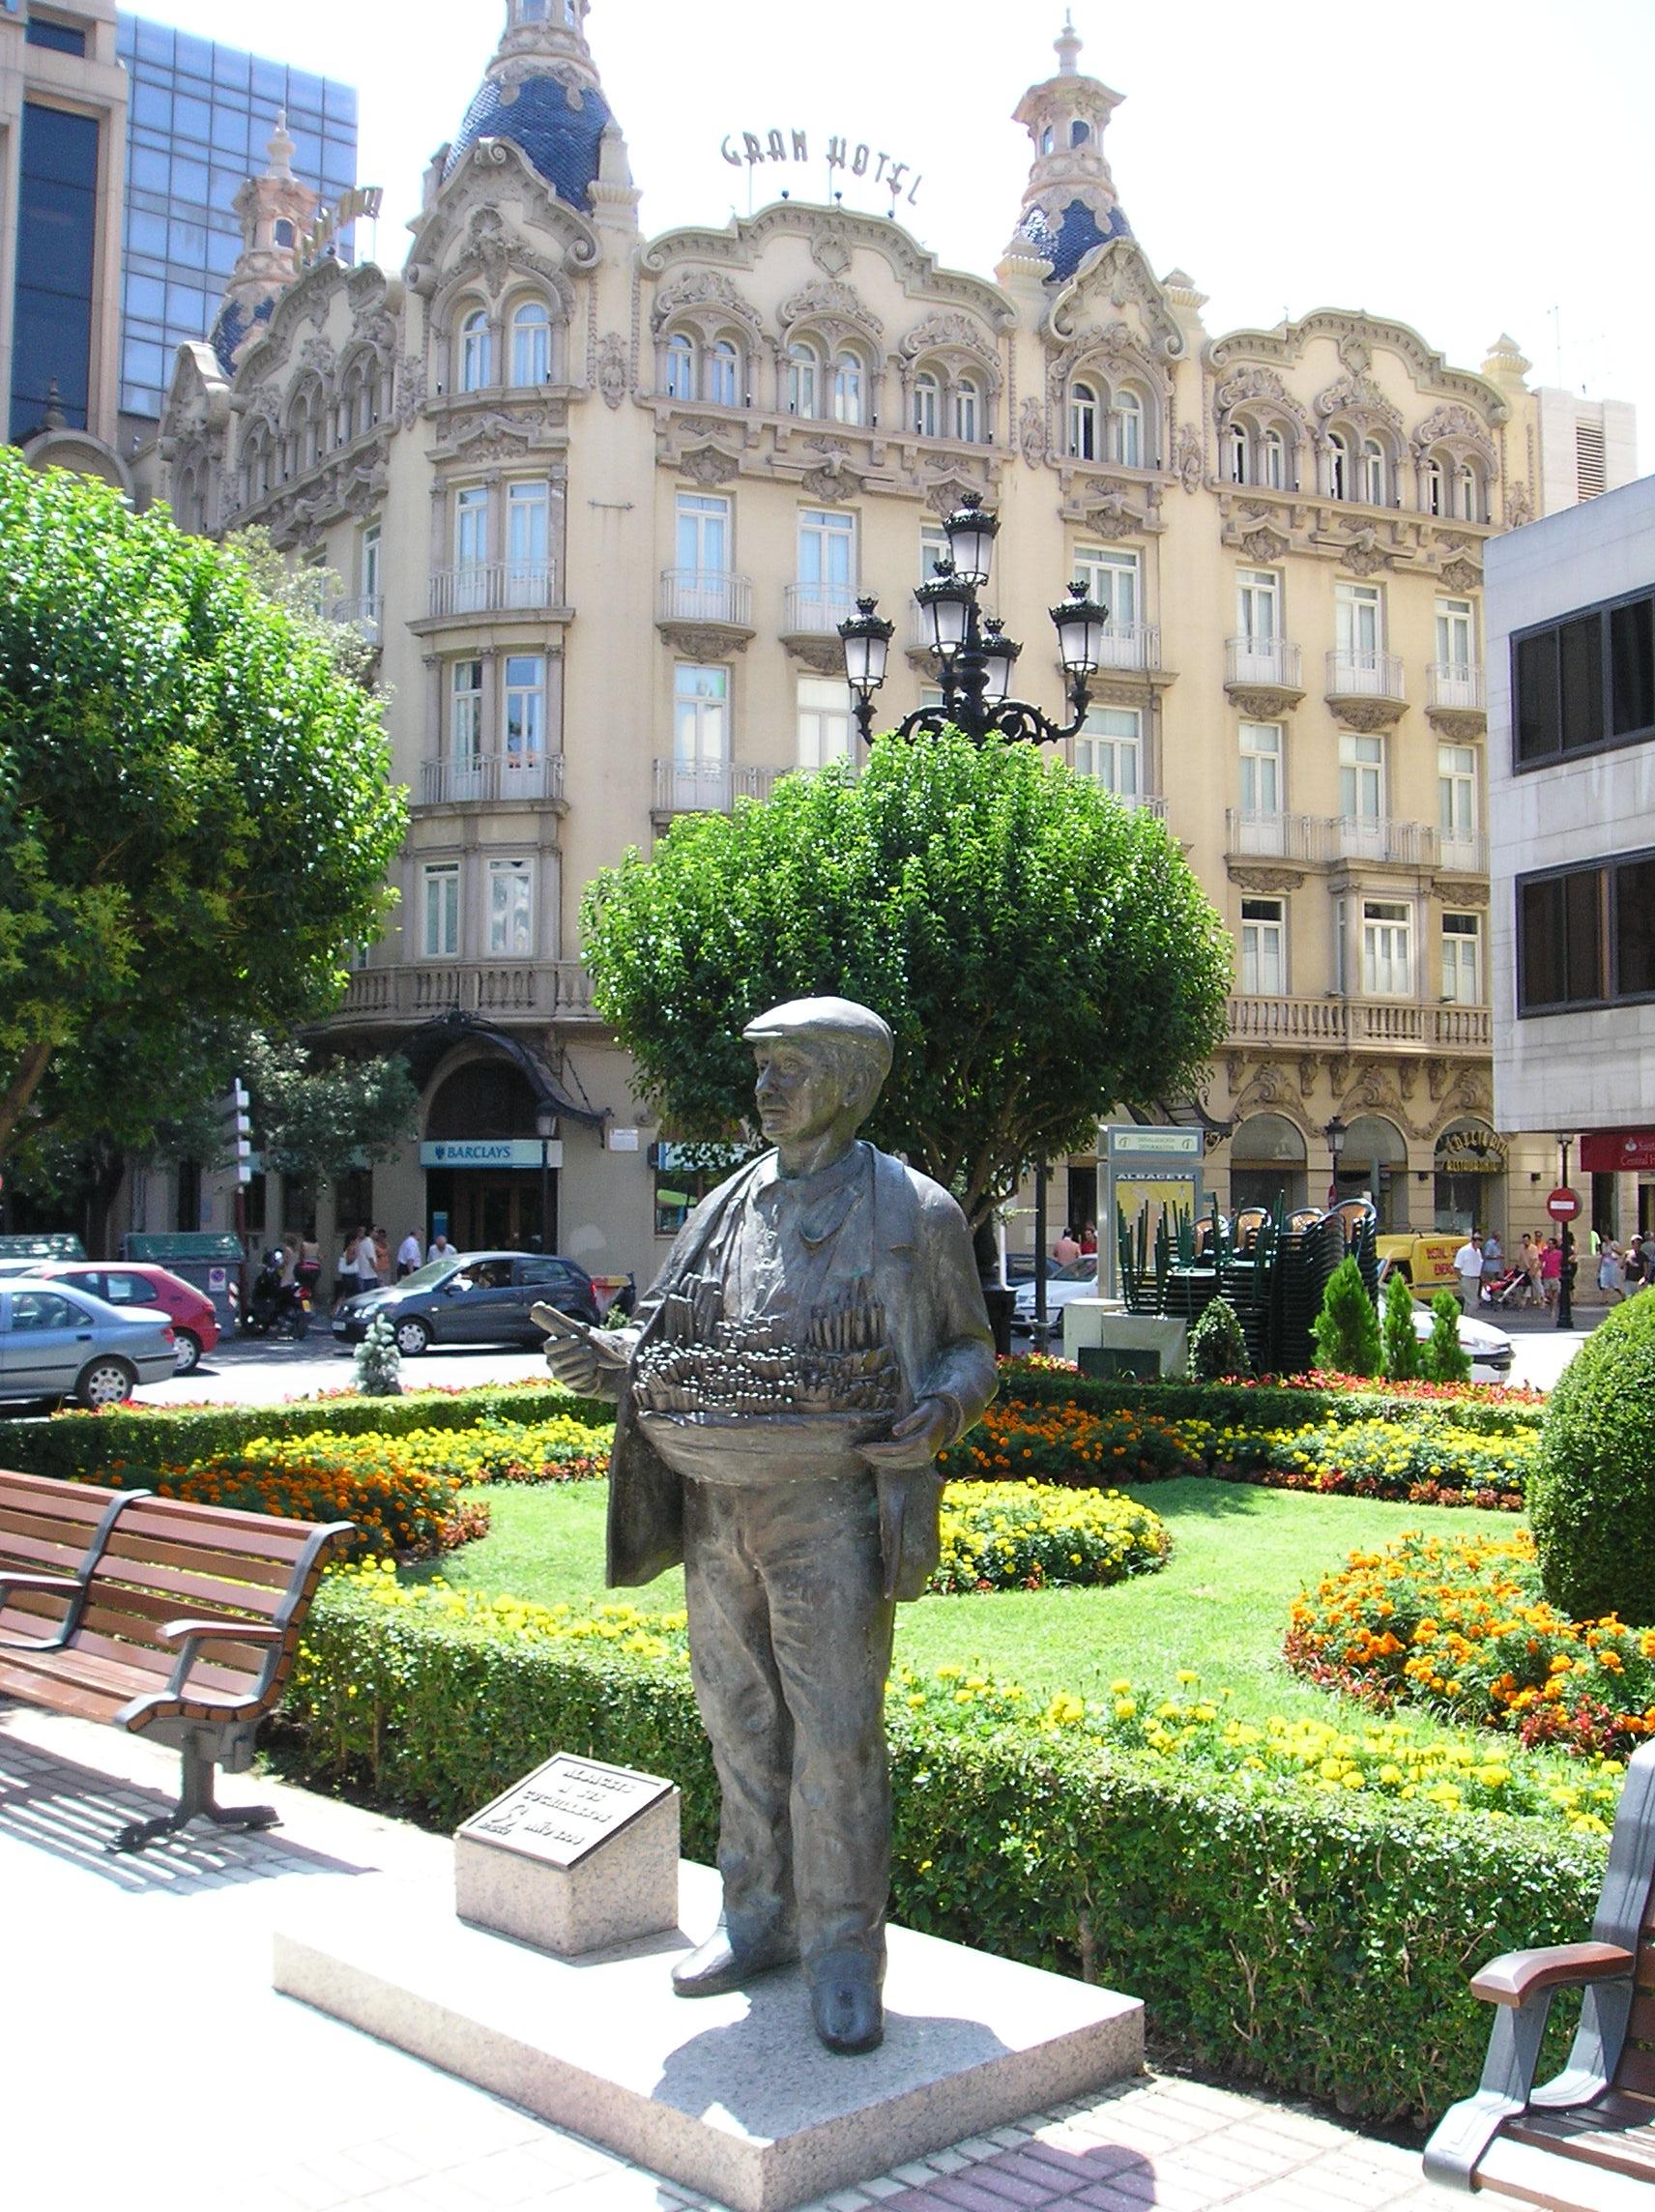 http://upload.wikimedia.org/wikipedia/commons/f/fc/Cuchillero_Albacete.jpg